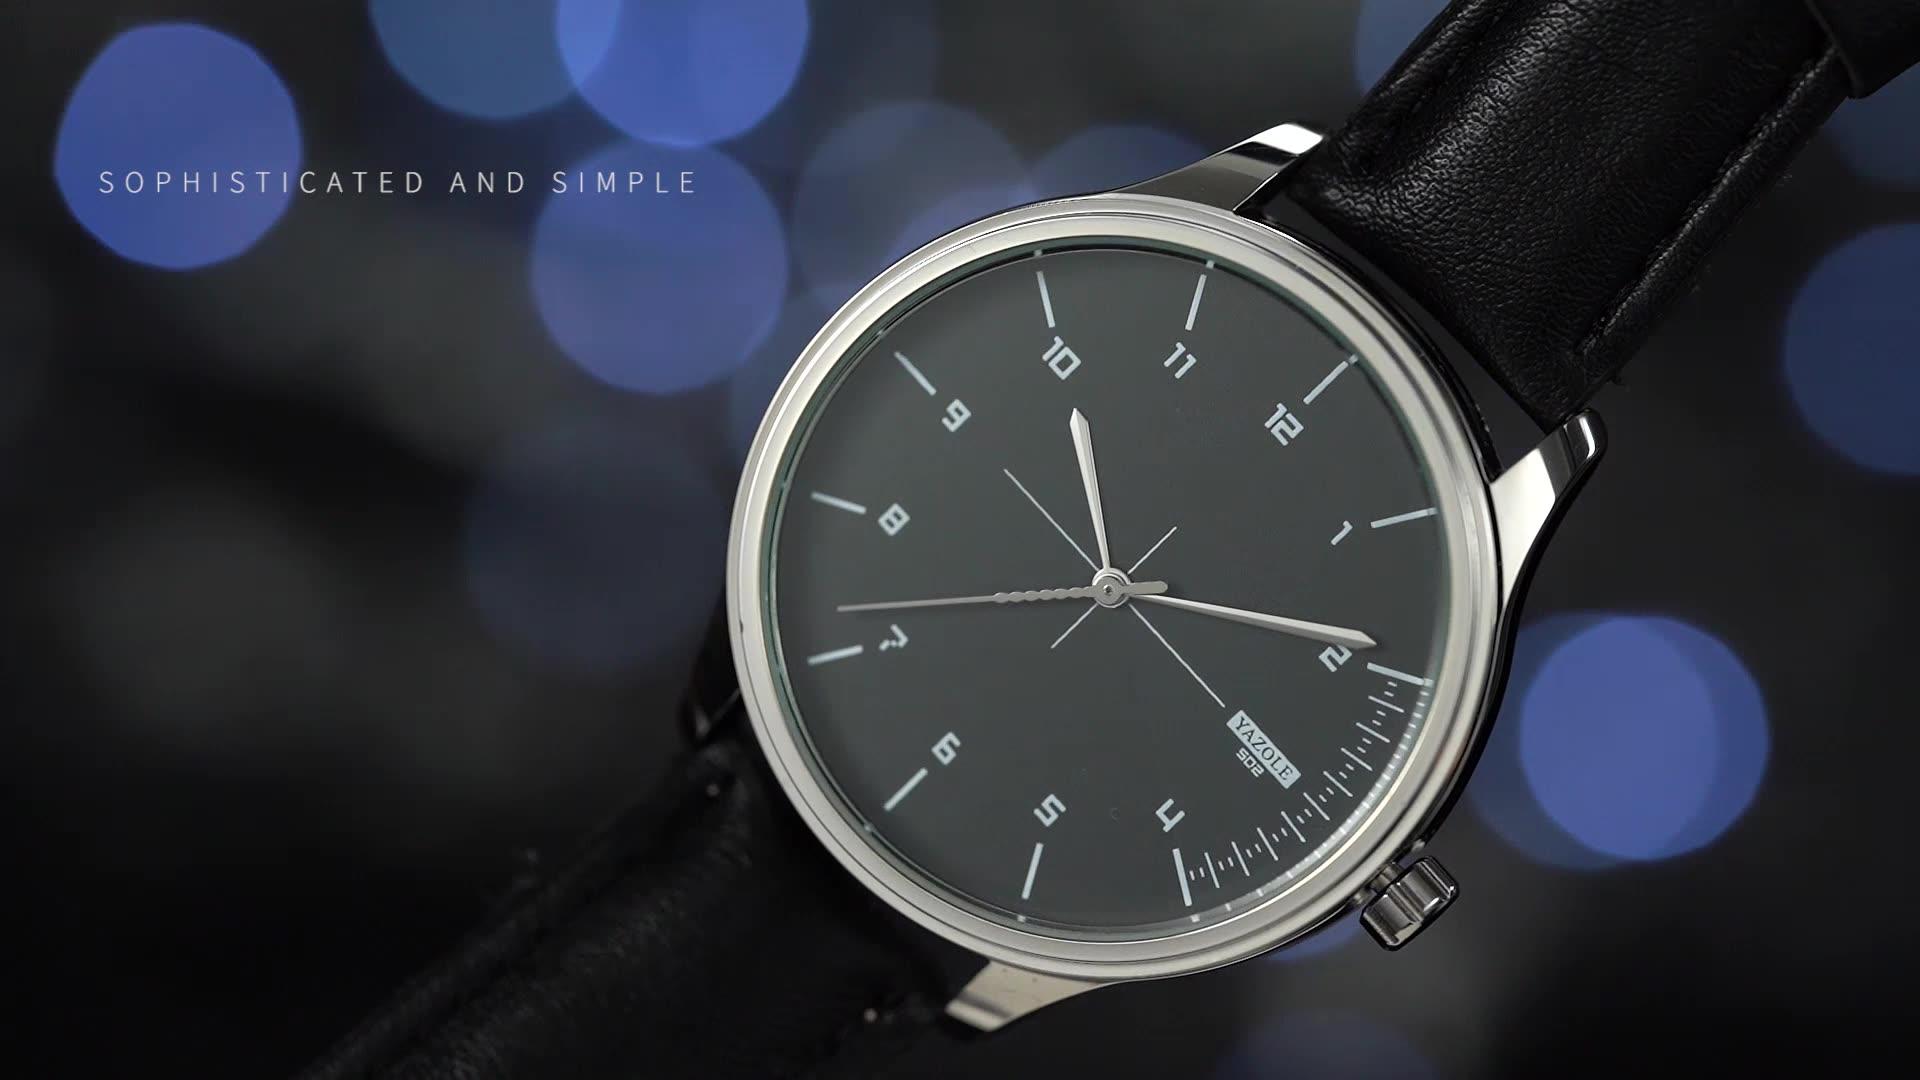 YAZOLE Z 502 Hot sale China Factory Wholesale Simple Mens watch with custom logo reloj quality quartz watches leather wristwatch